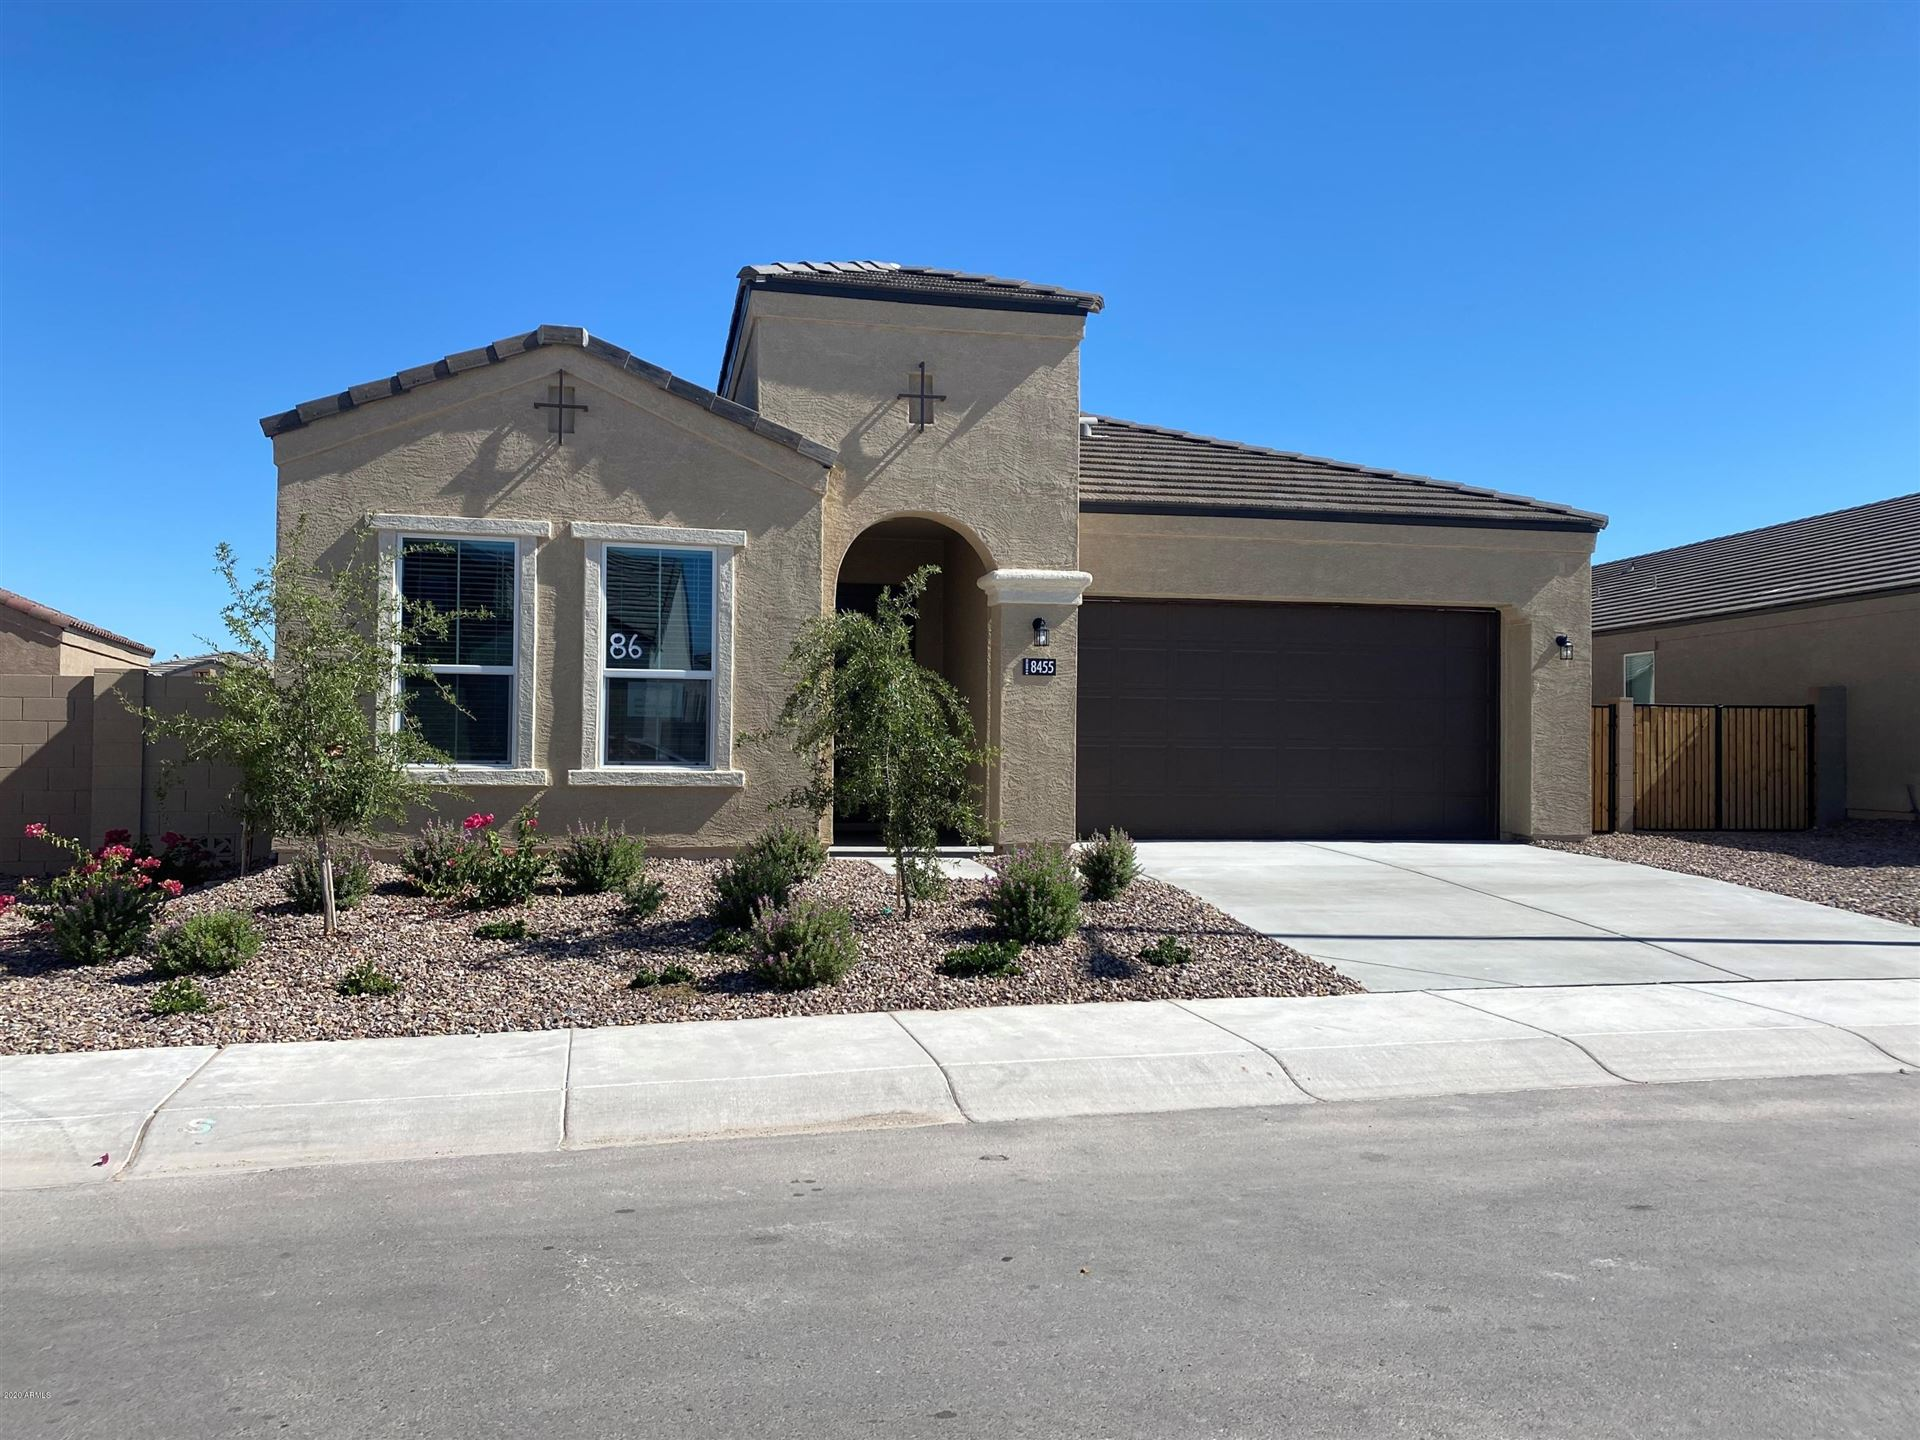 8455 W SONOMA Way, Florence, AZ 85132 - MLS#: 6093480